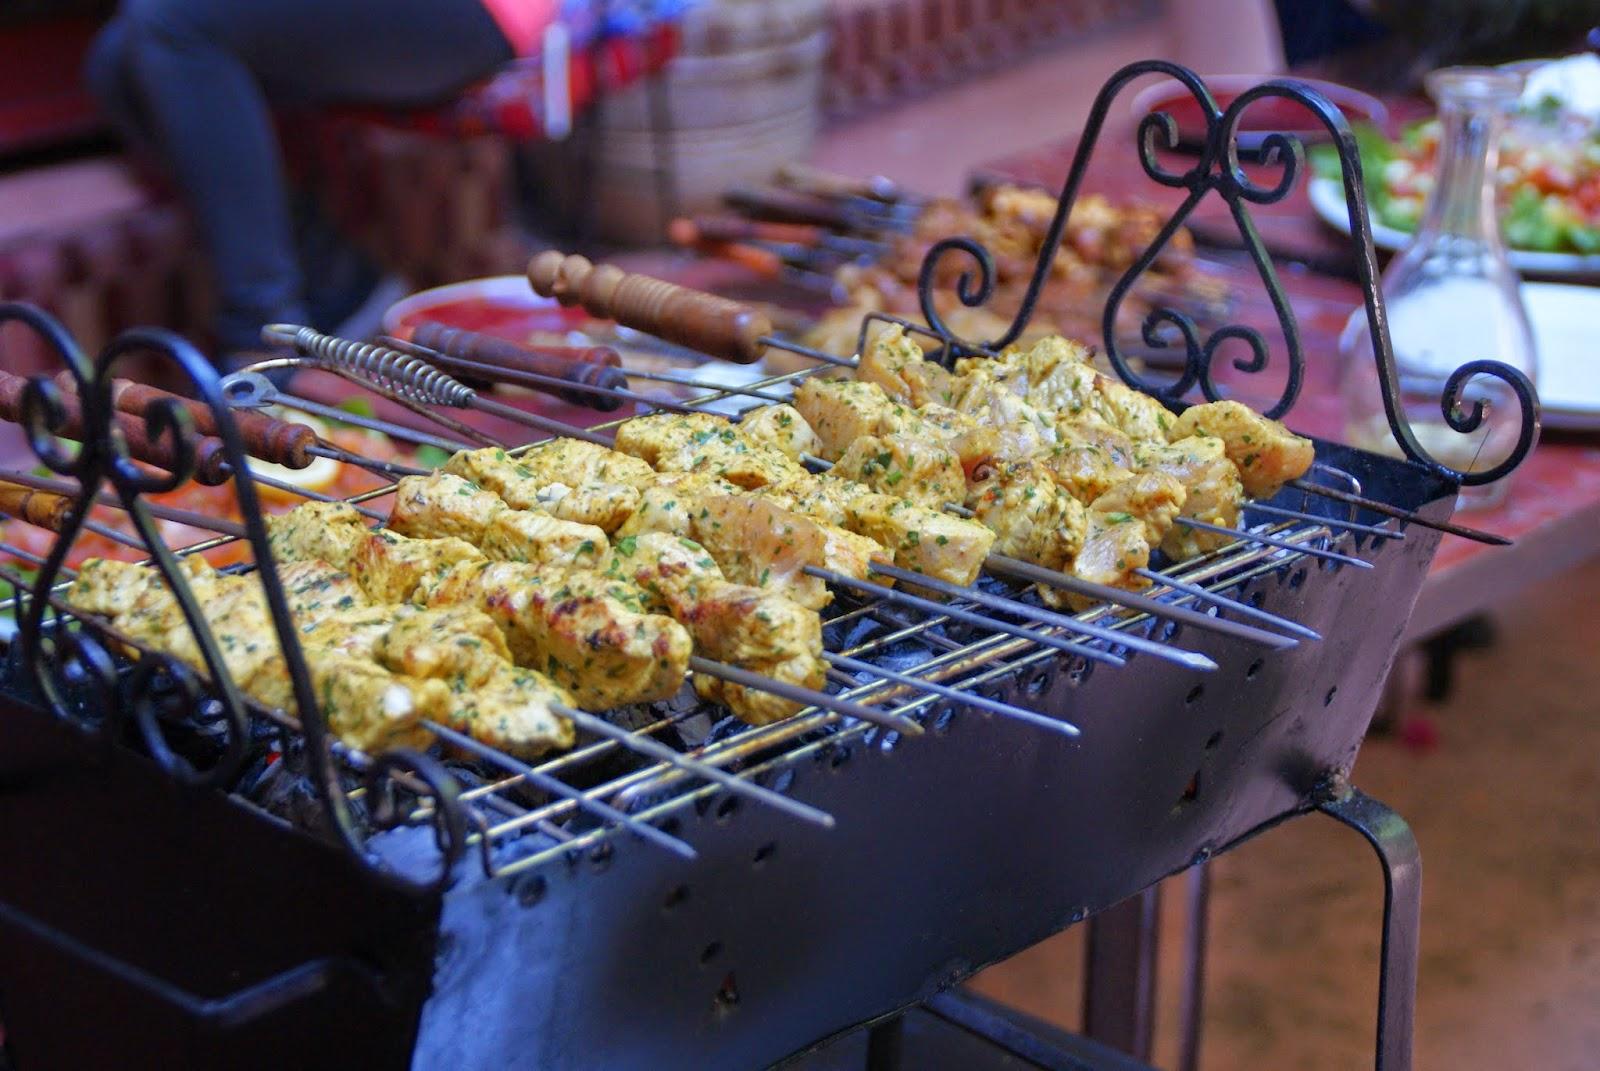 Marokkansk grillspyd